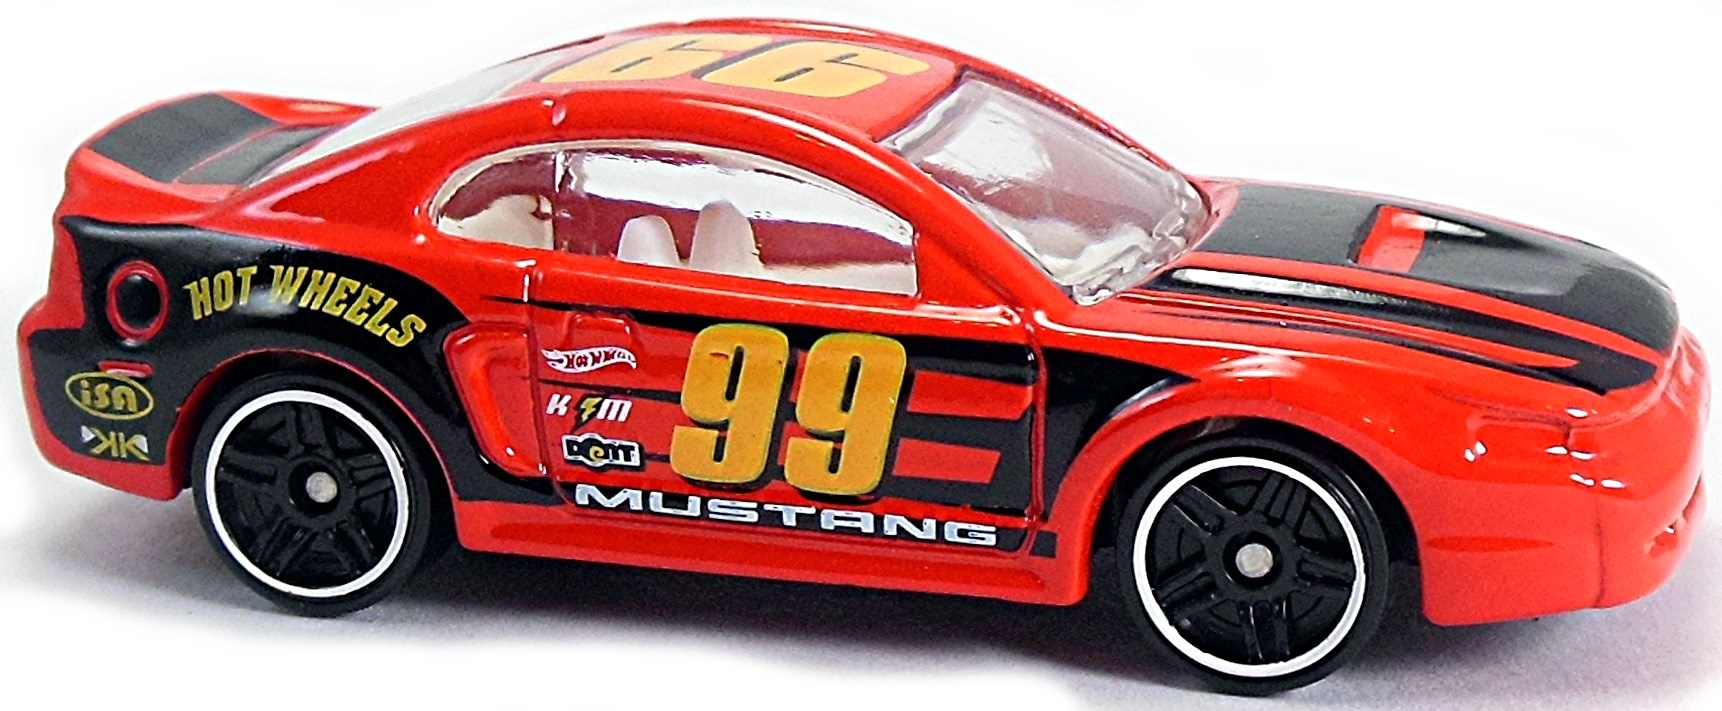 99 Mustang - Hot Wheels Wiki